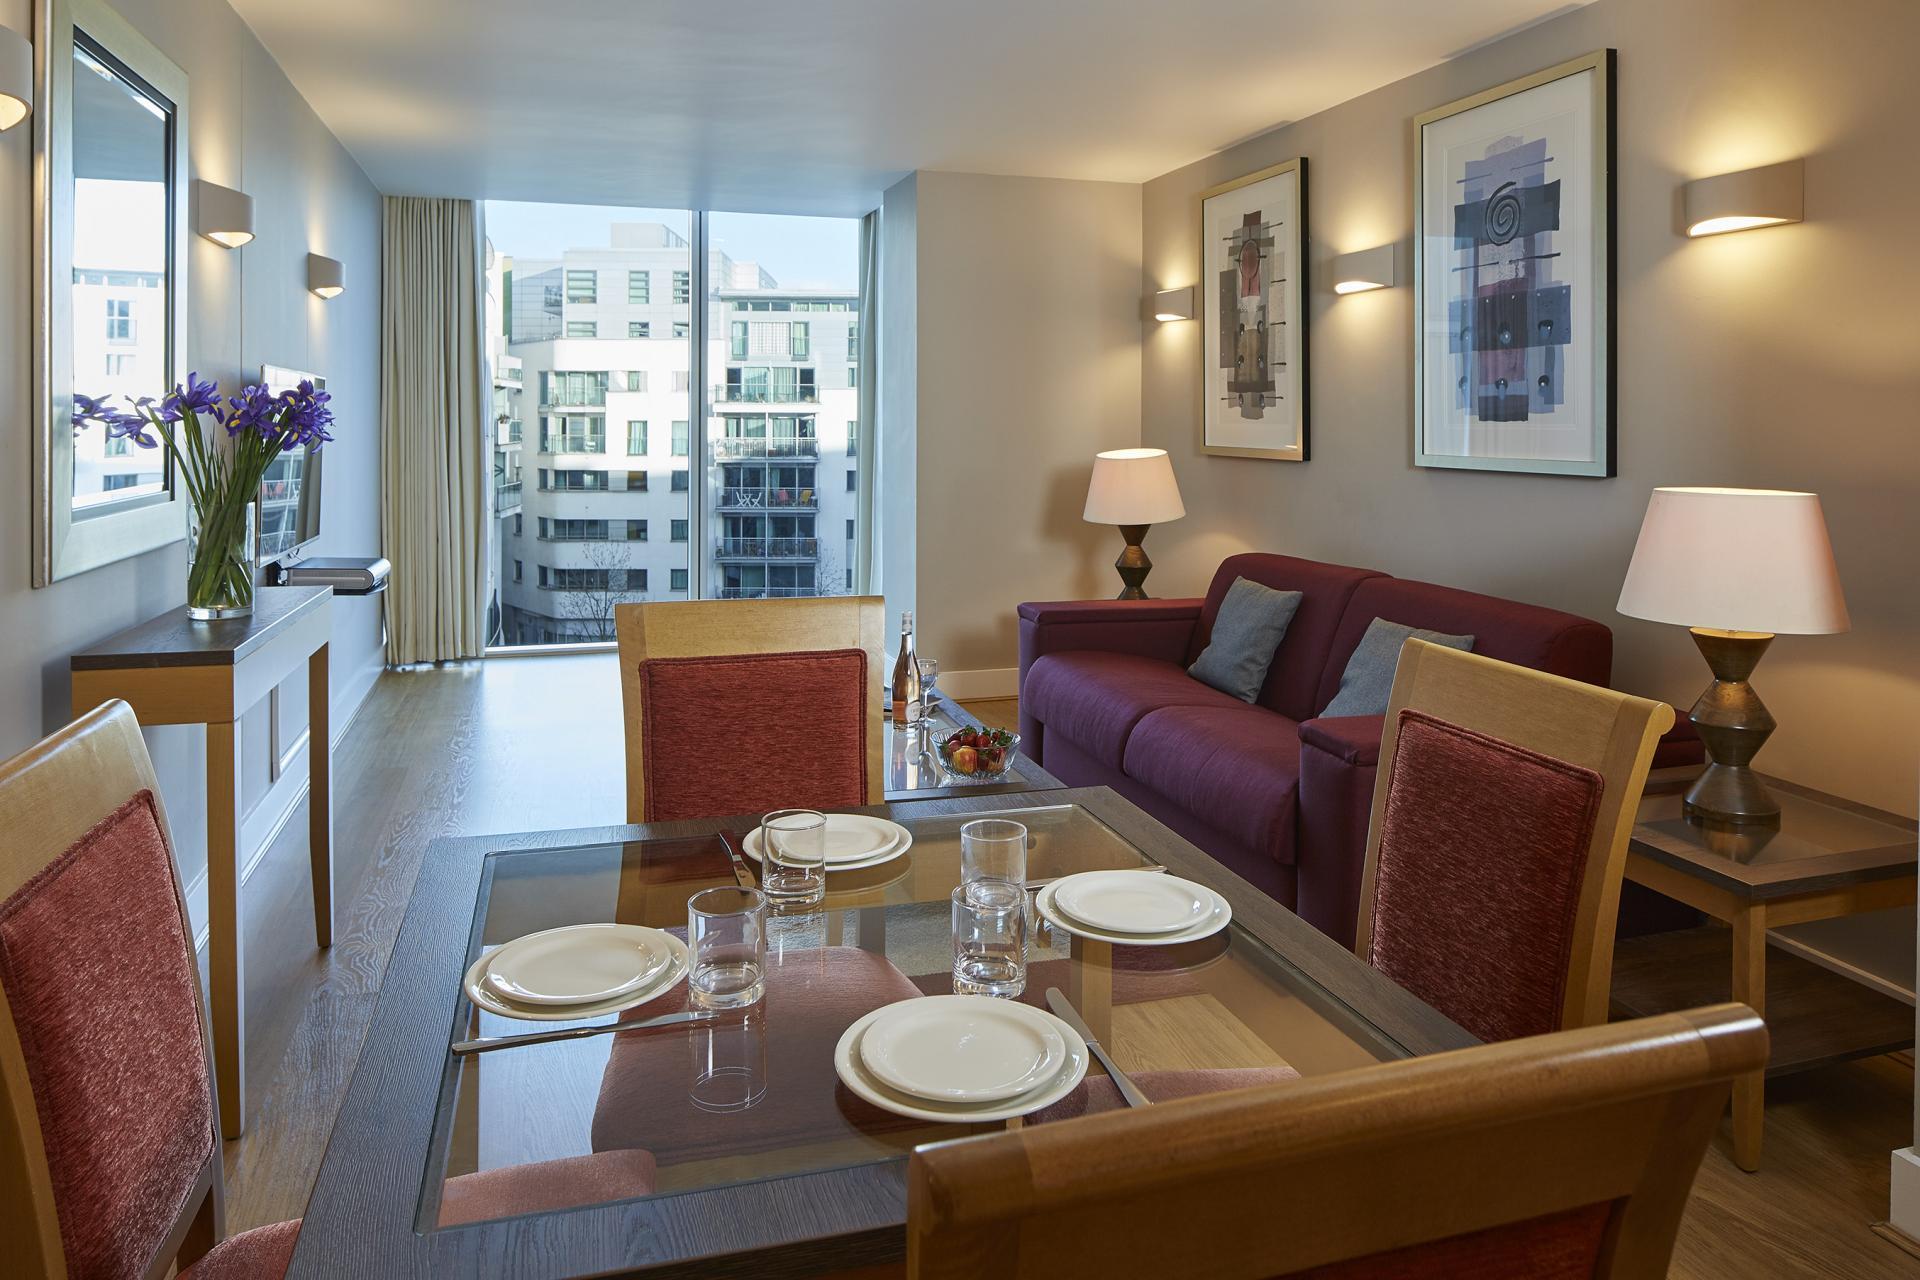 Dining area at Empire Square Apartments, London Bridge, London